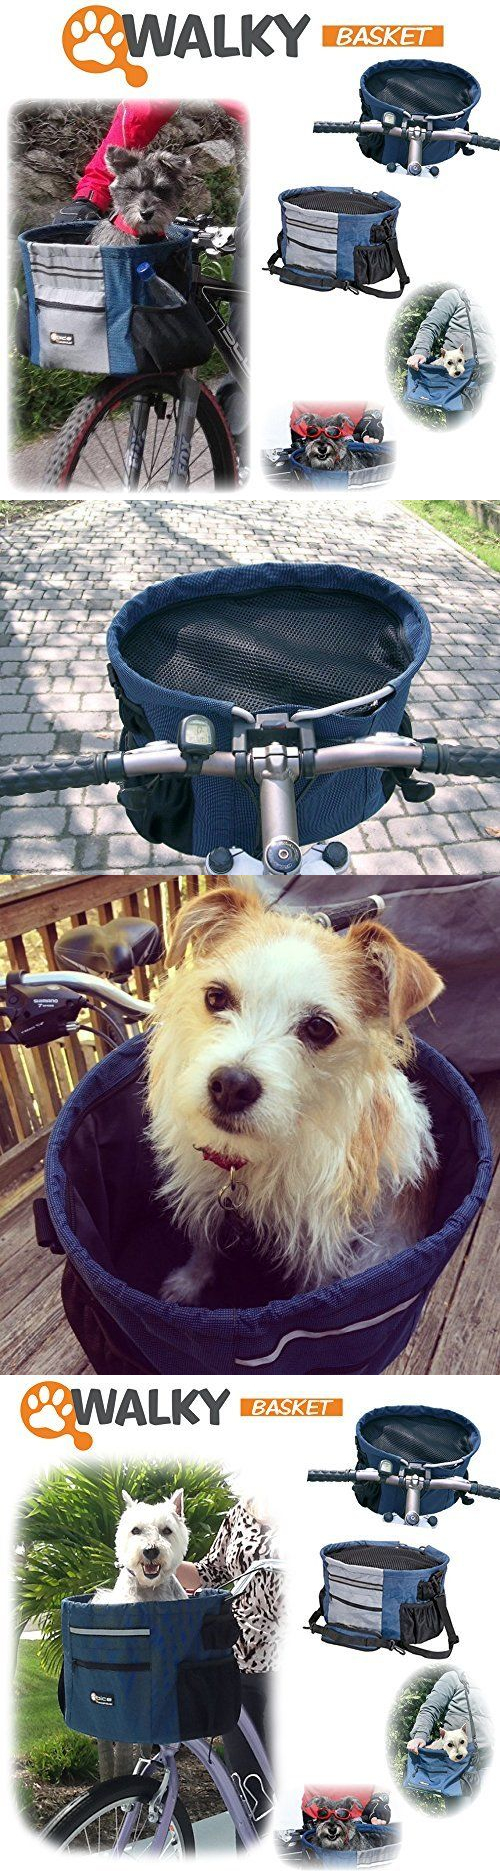 Bike baskets and trailers walky basket pet dog bike basket